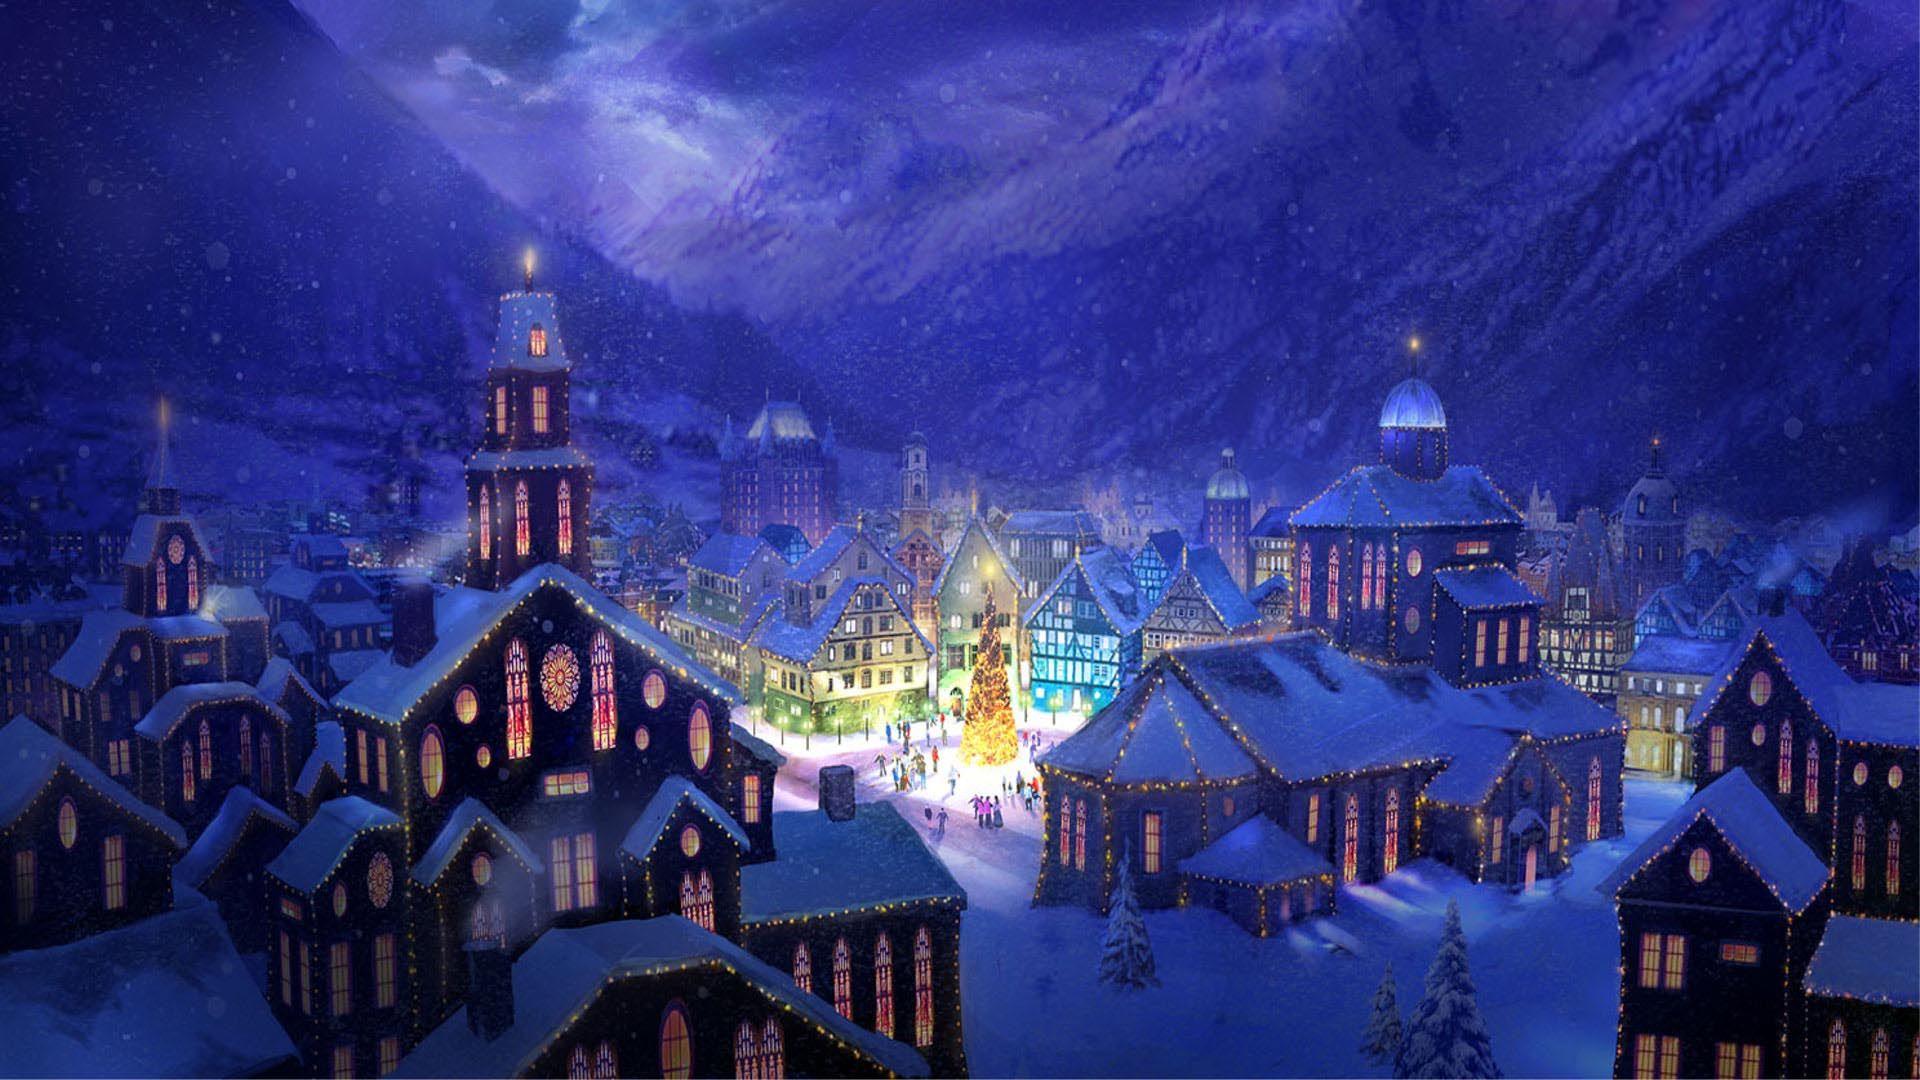 Christmas Village Square Hd Wallpaper Fullhdwpp Full Hd Wallpapers 1920x1080 Christmas Wallpaper Hd Christmas Town Christmas Landscape